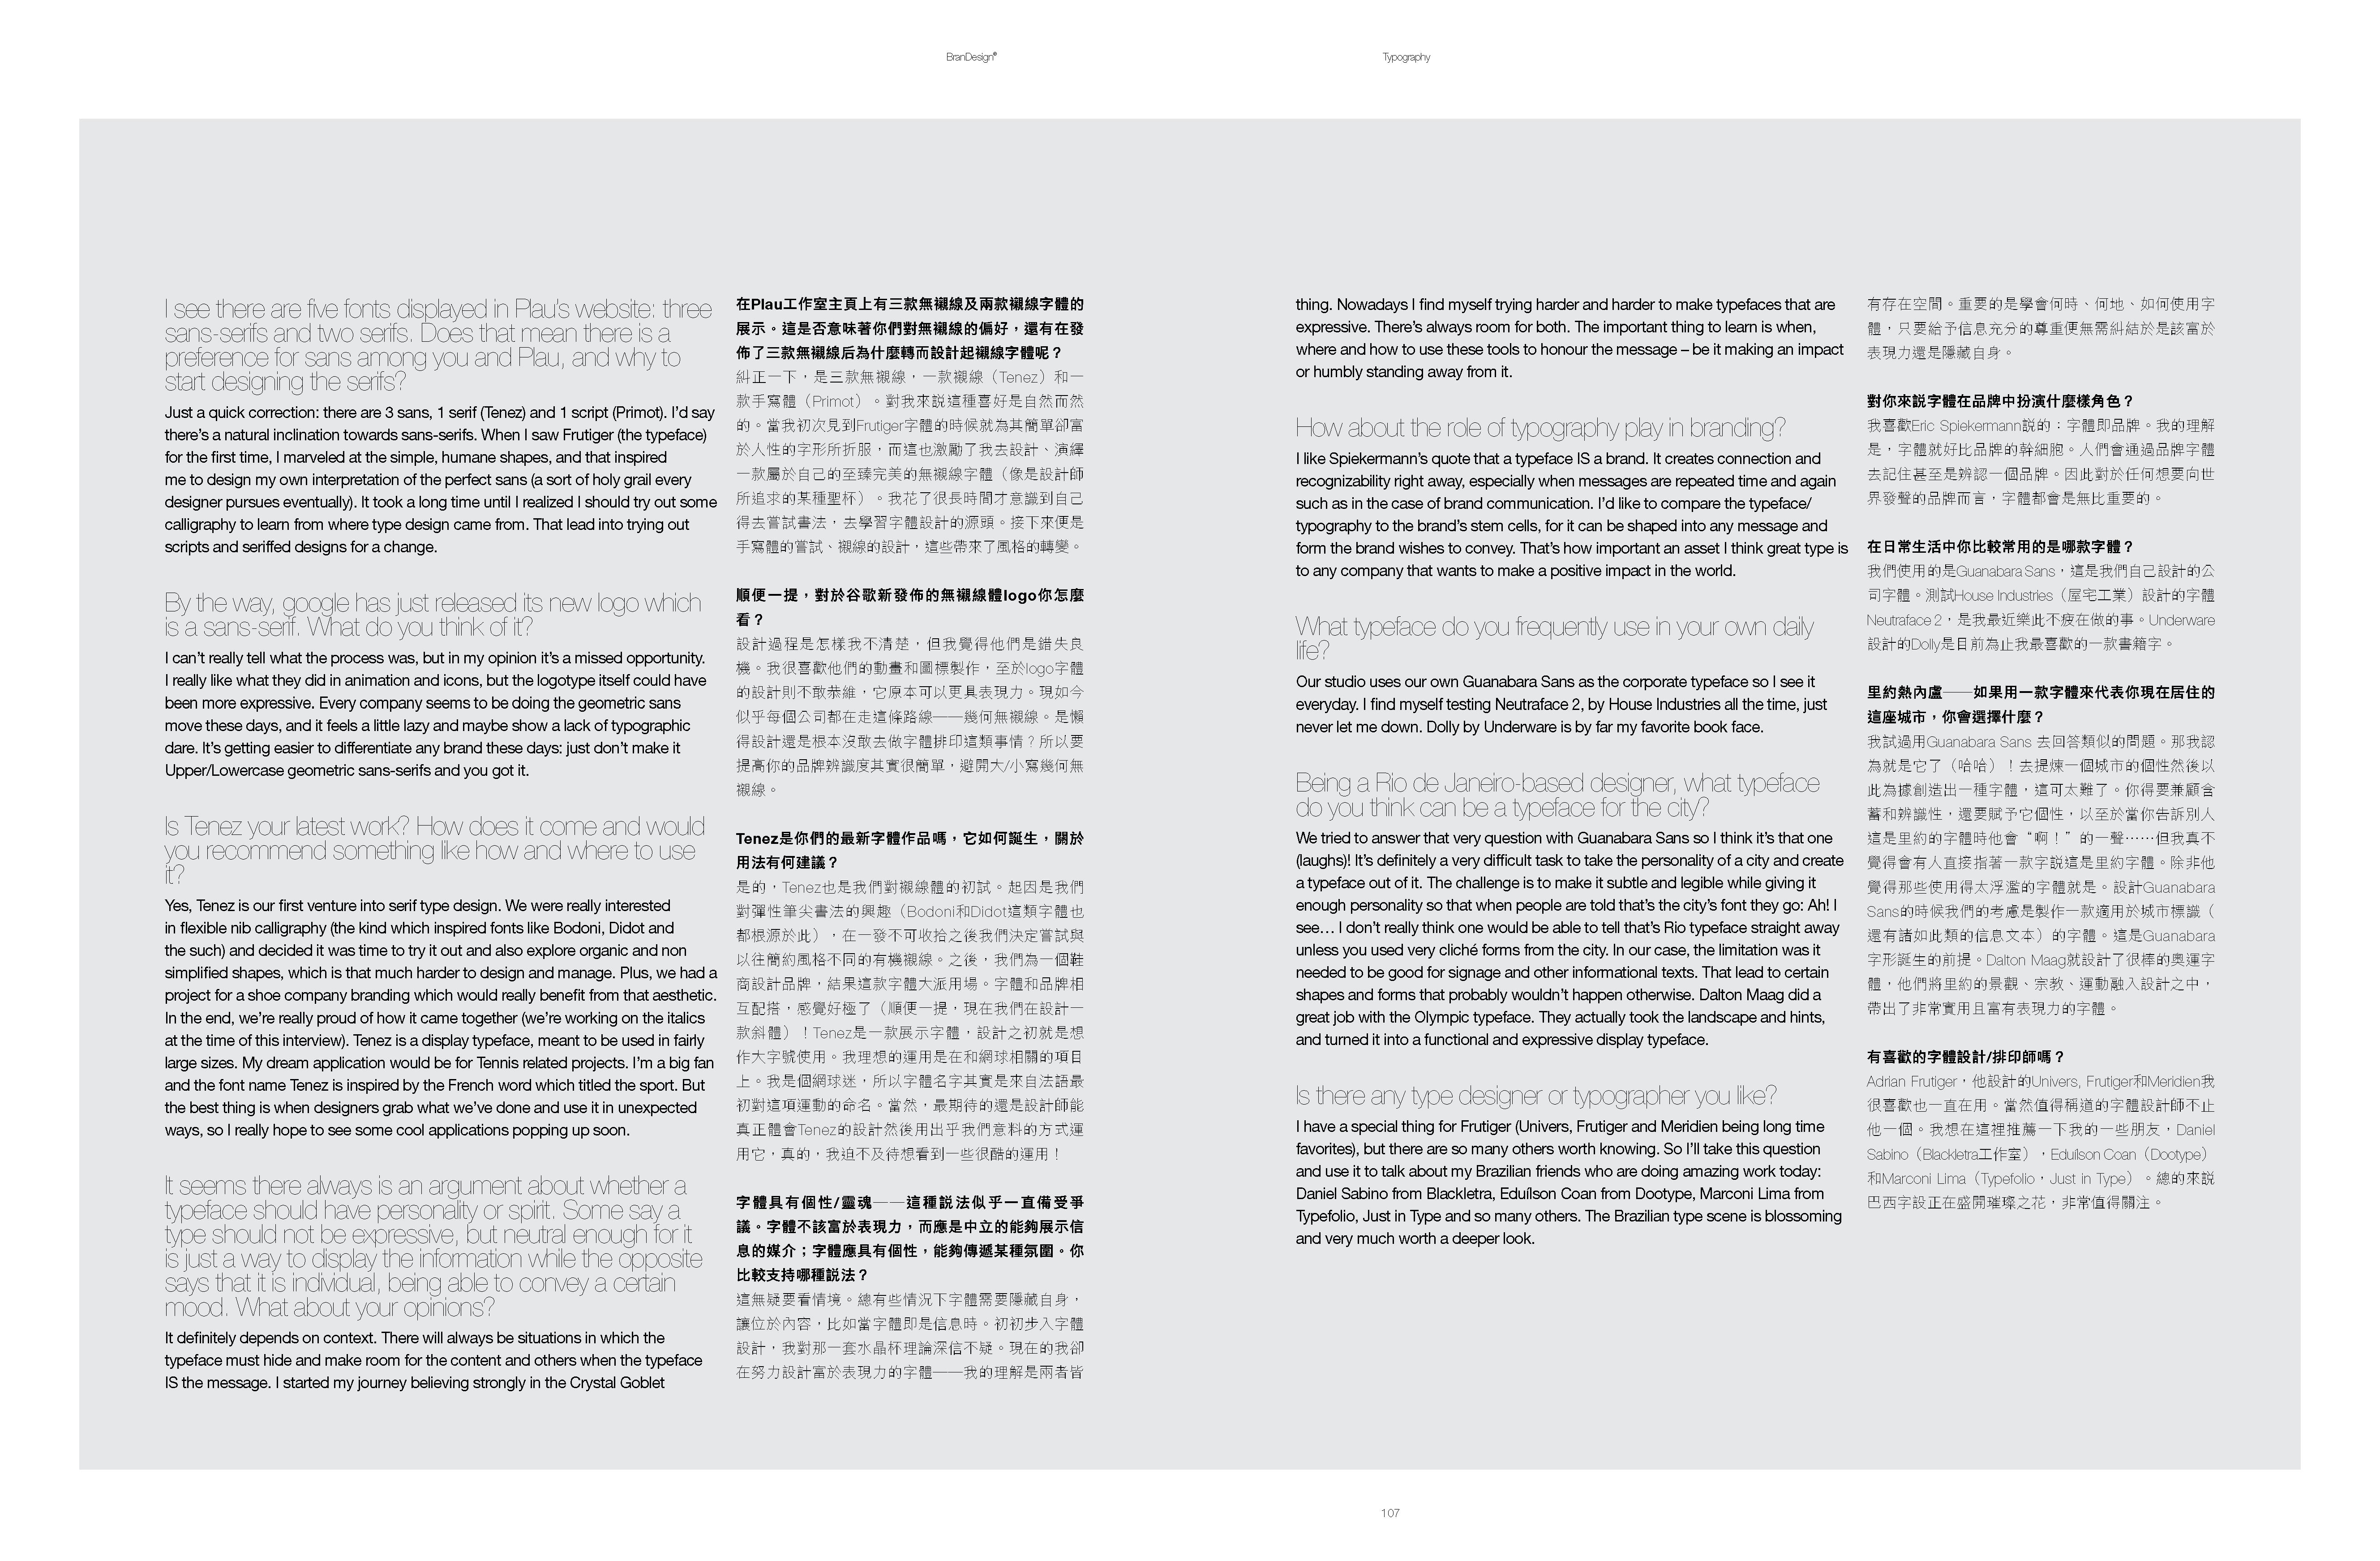 brand-magazine-plau-interview-page-2